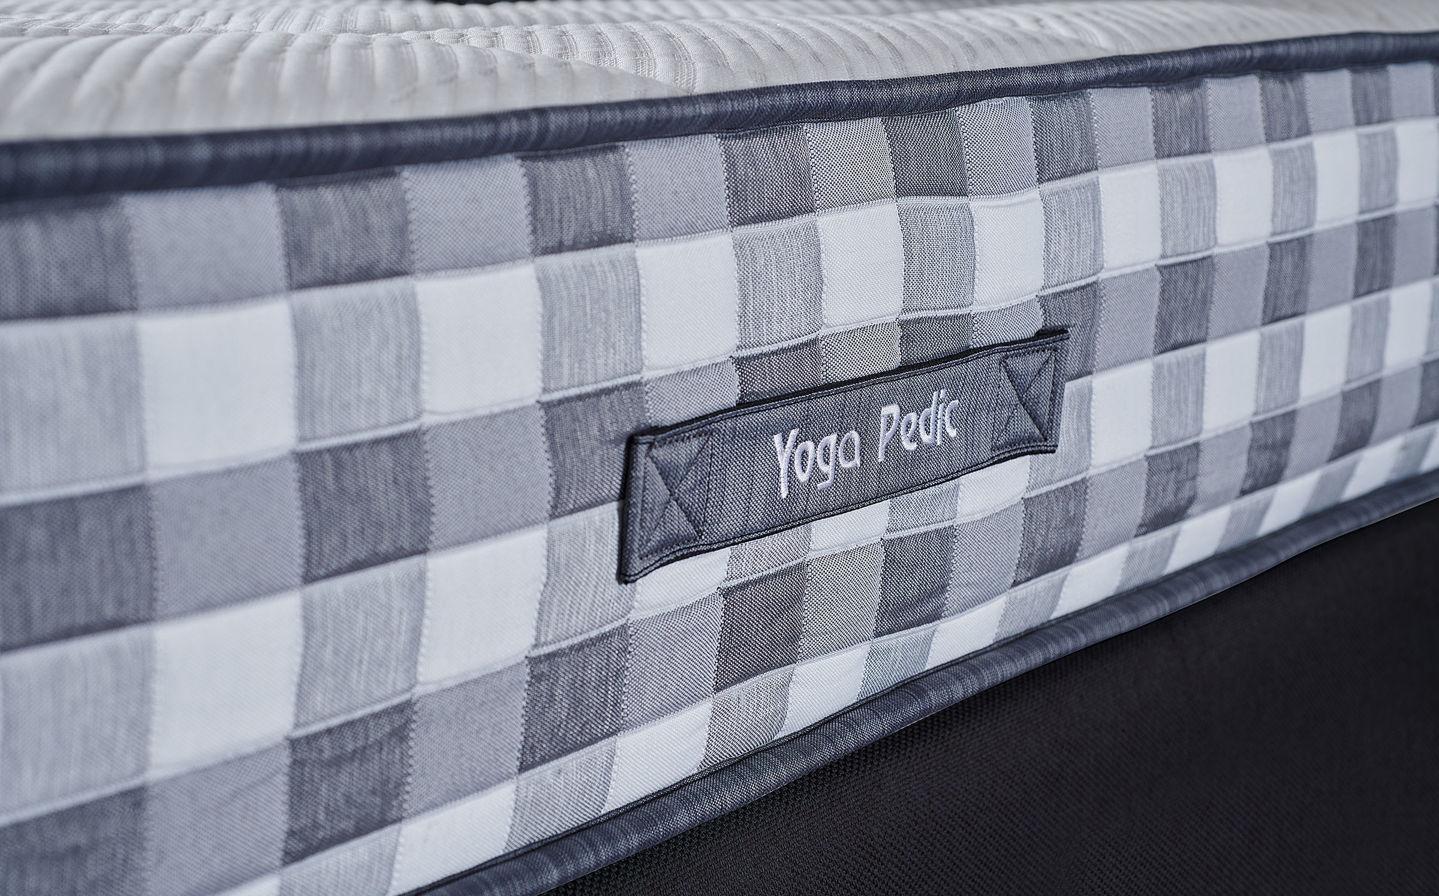 Yoga Pedic Yatak 140 X 200